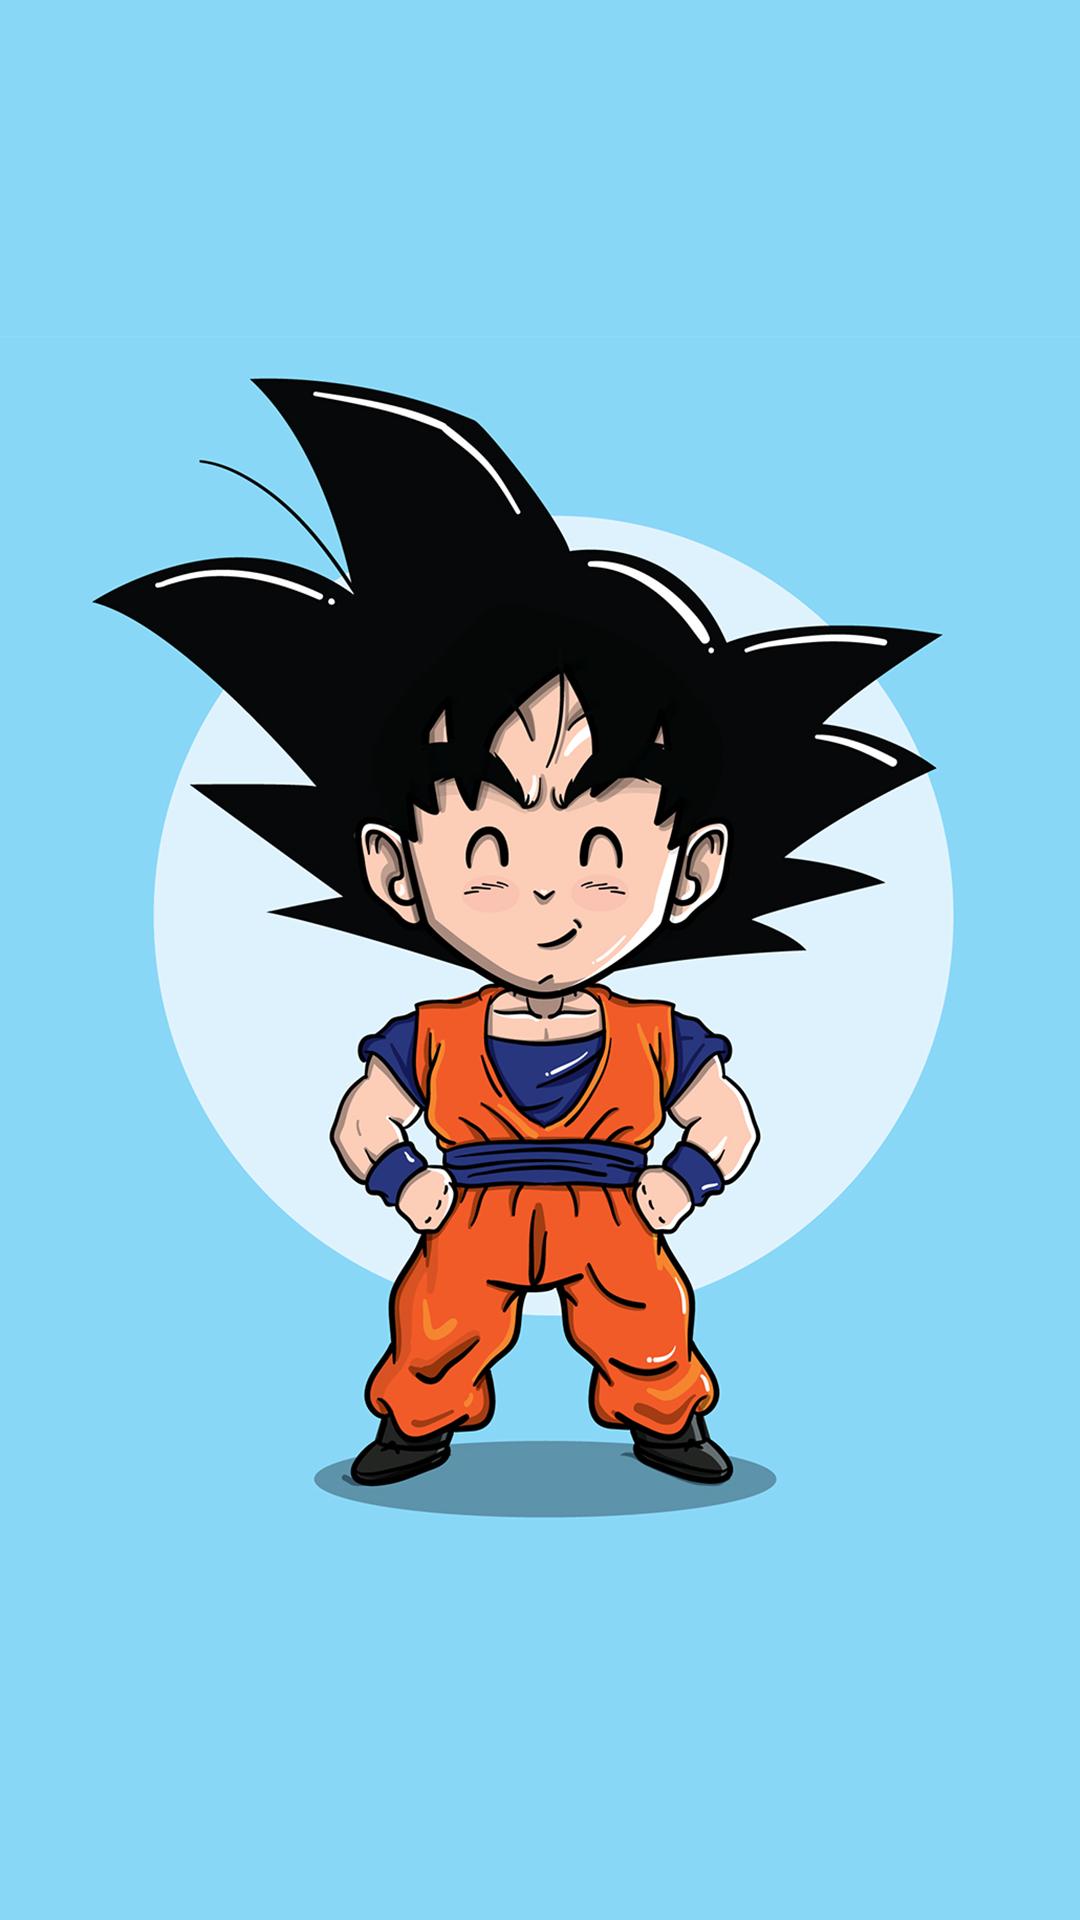 Wallpaper Ilustrasi Anime Gambar Kartun Bola Naga Dragon Ball